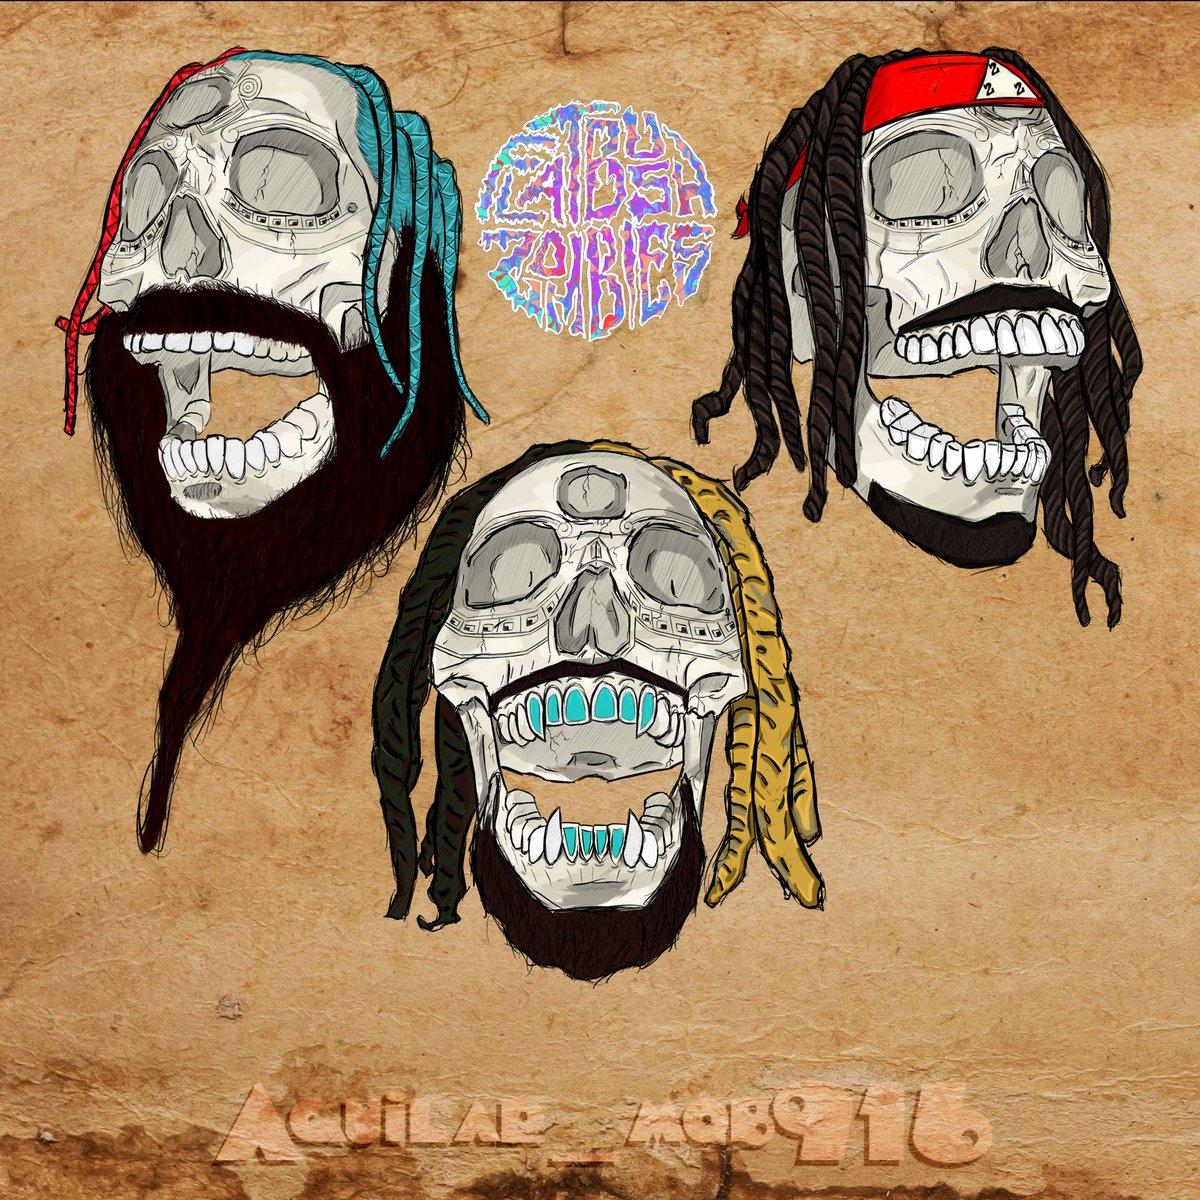 Aztec Zombie Skulls @ZOMBIEJuicee @MeechIsDEAD @erickarcelliott @FlatbushZombies